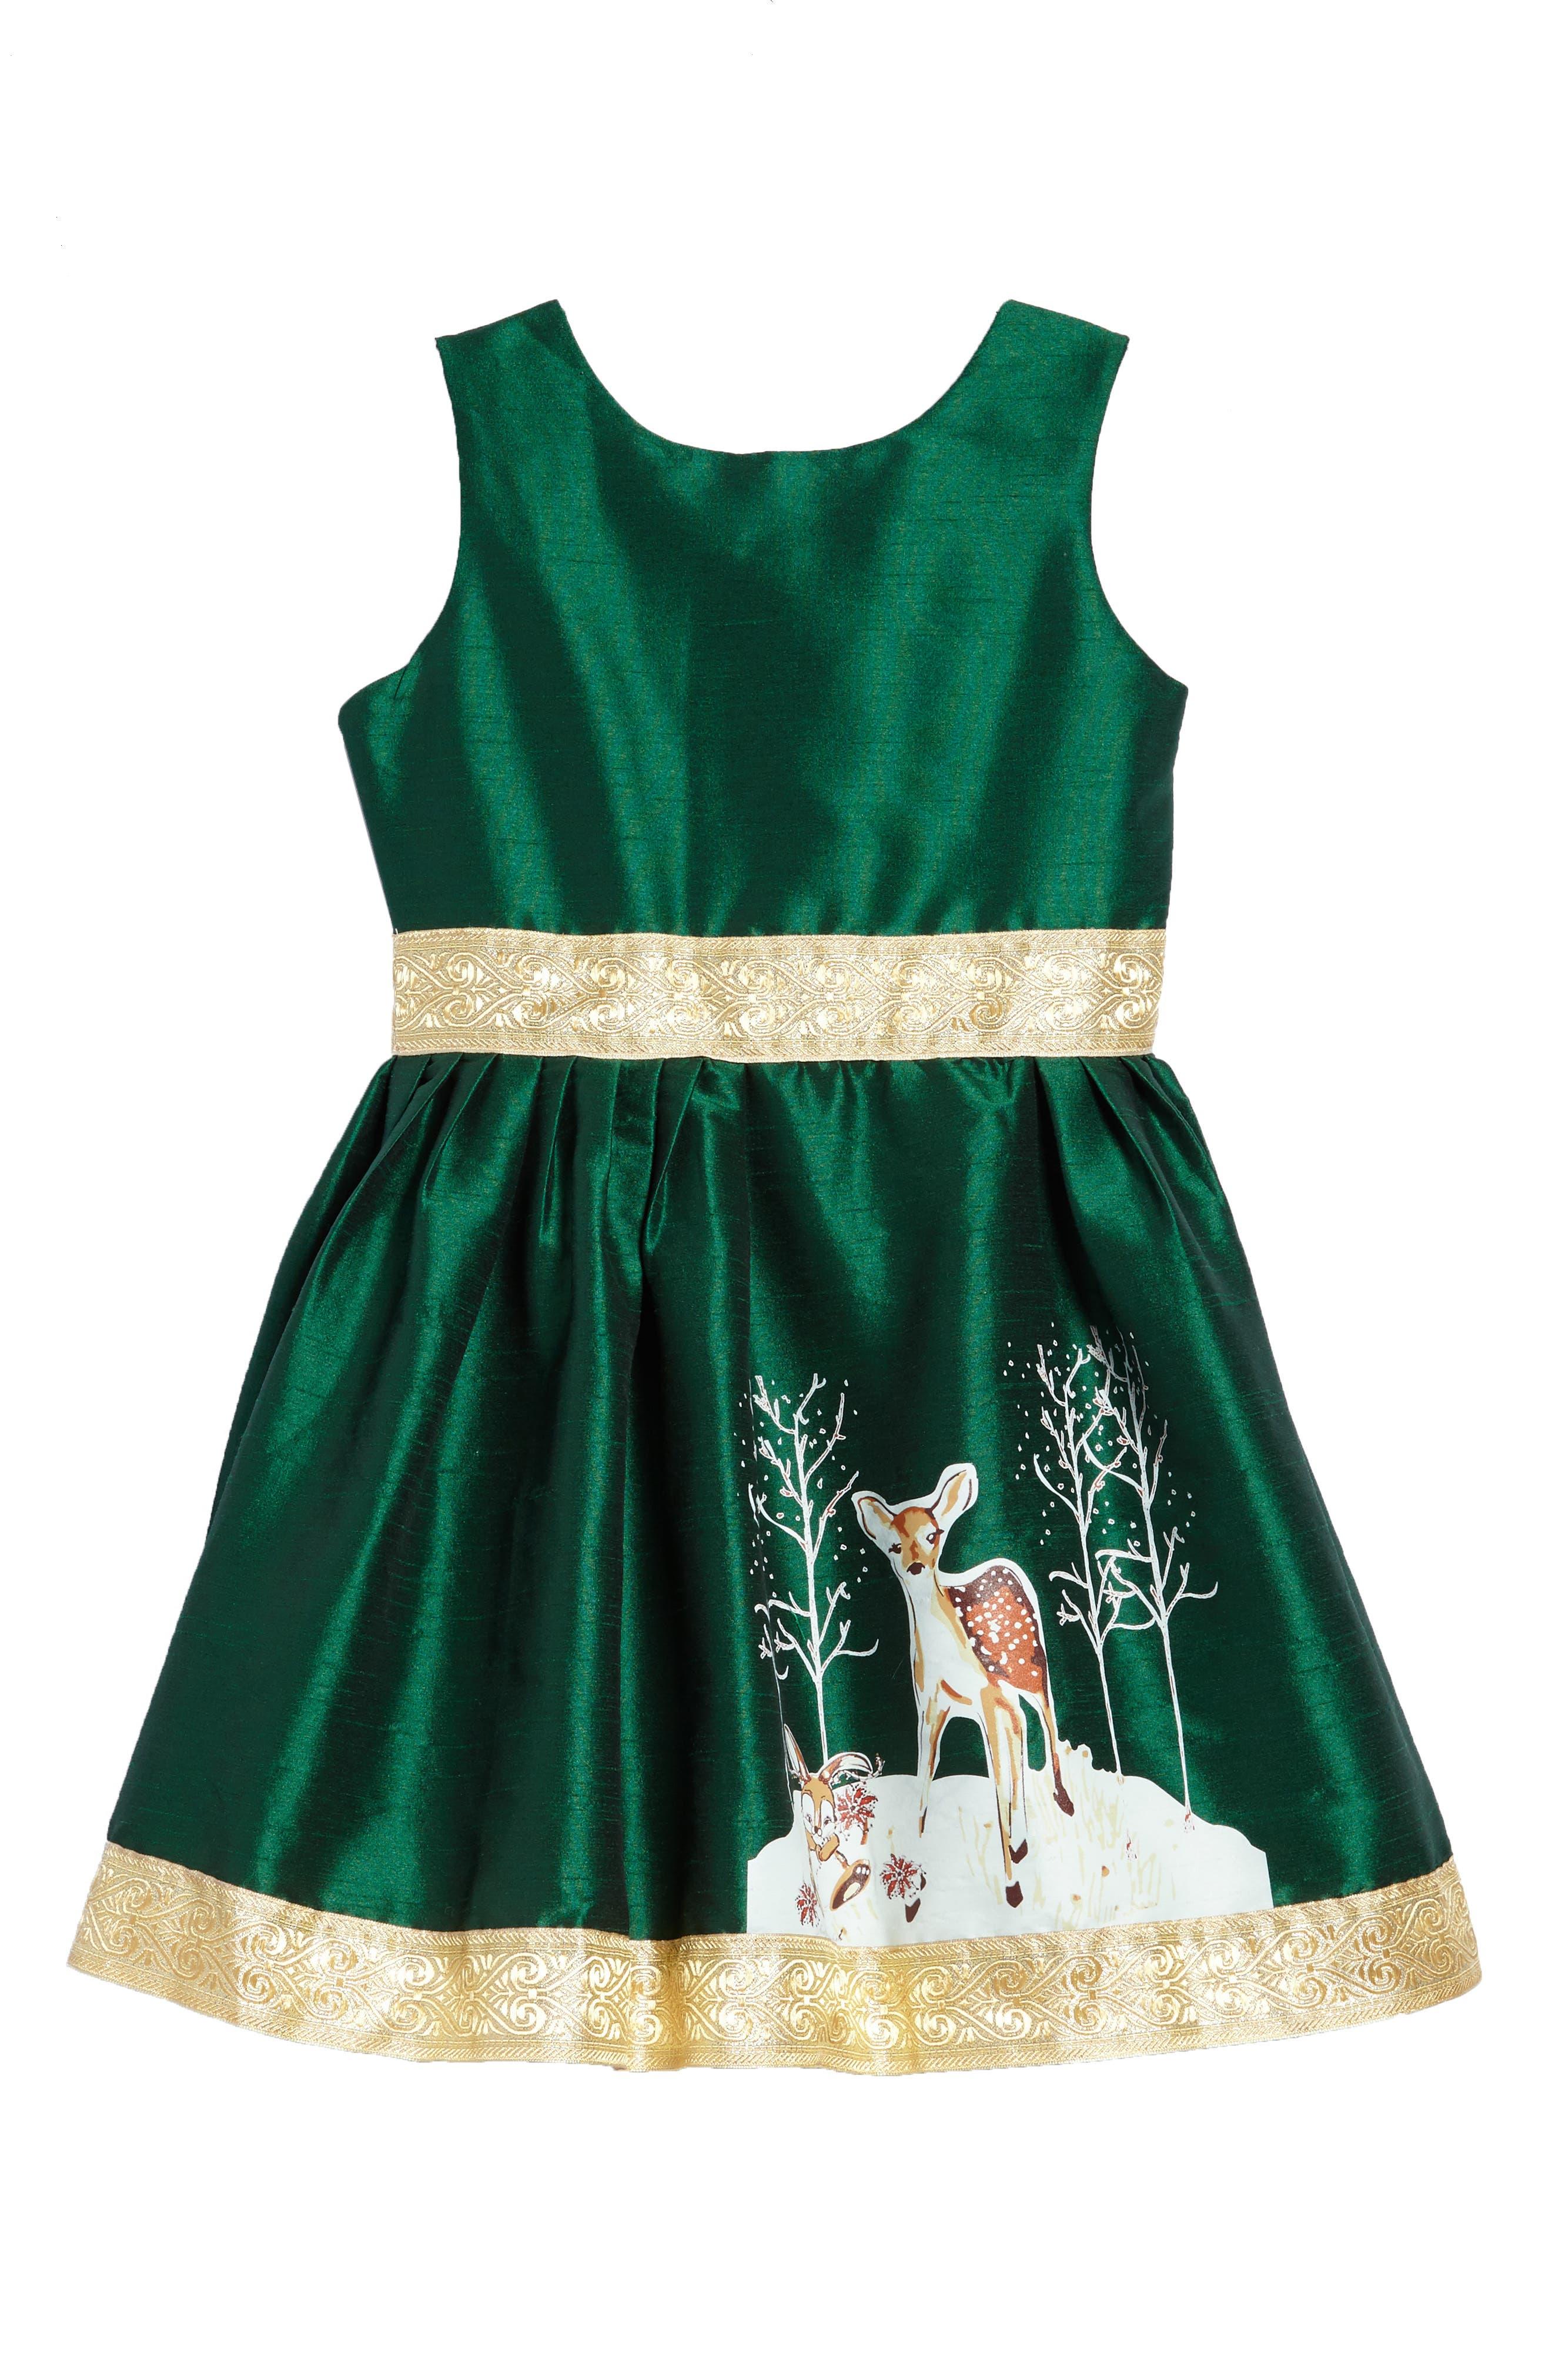 Fawn of Winter Dress,                             Main thumbnail 1, color,